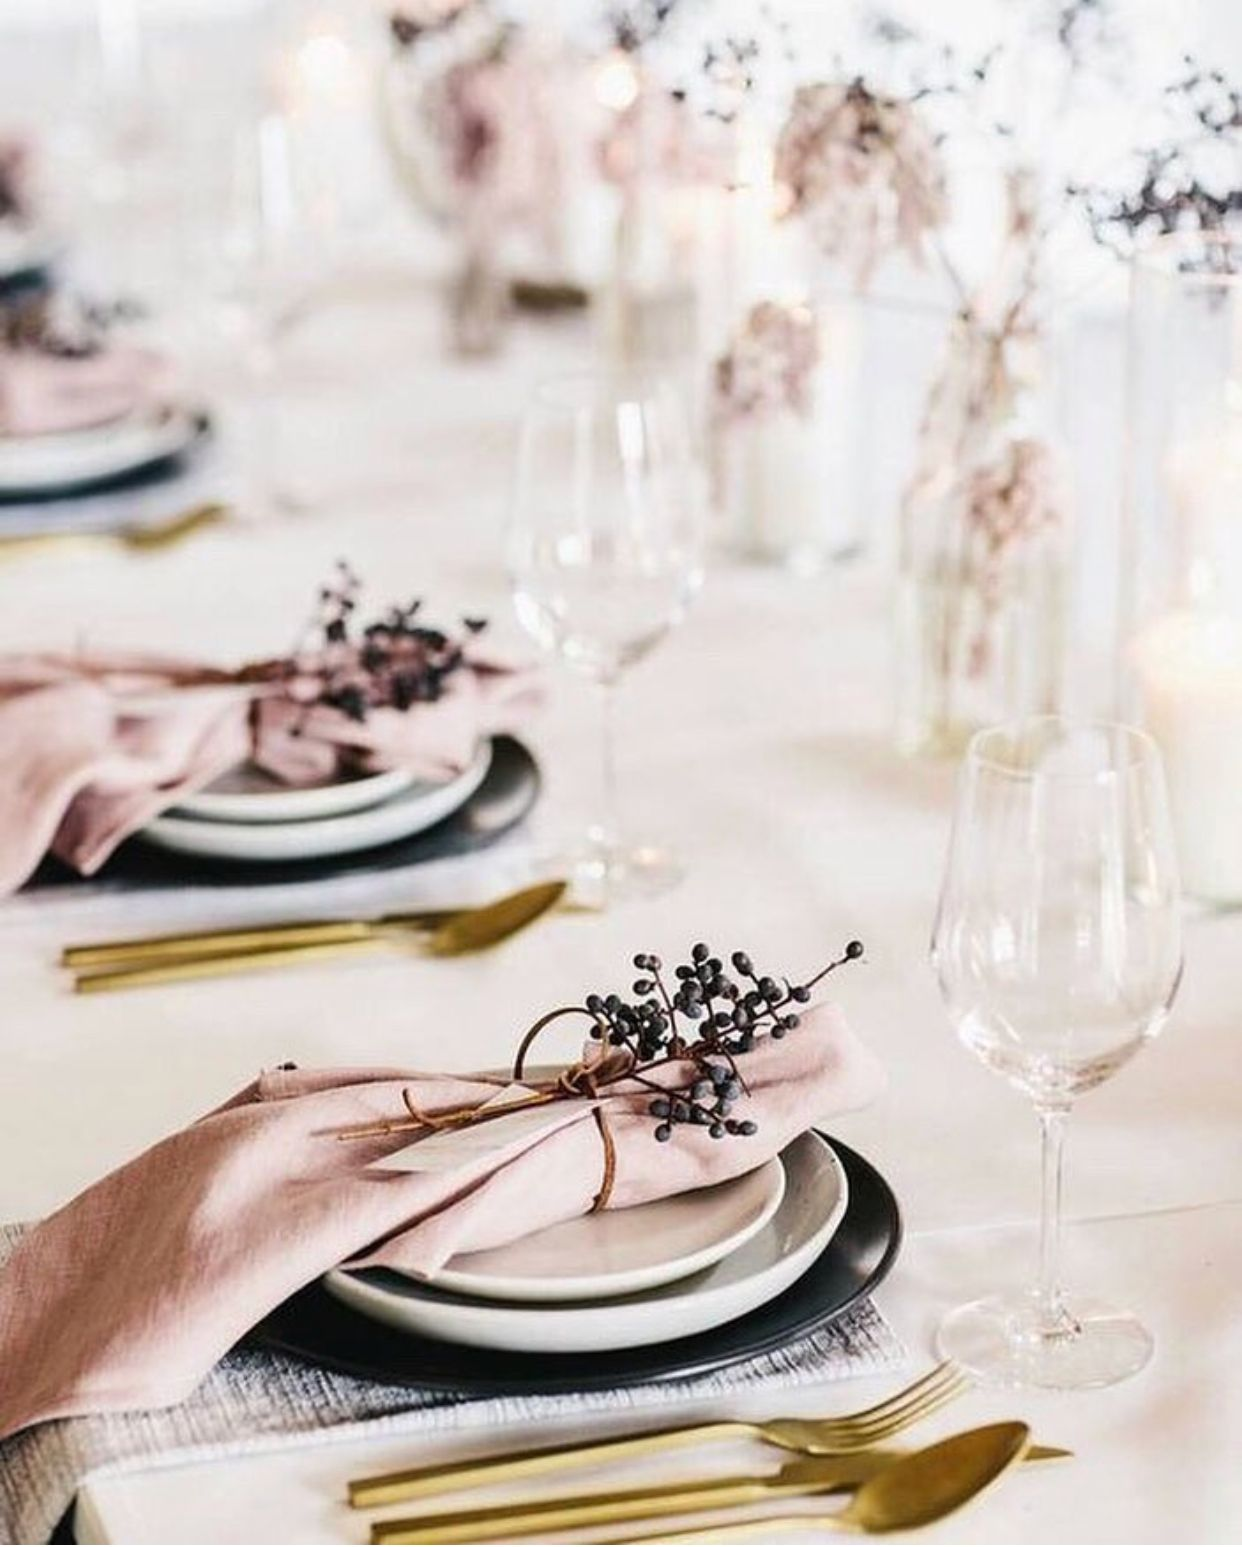 Pin by Sara Gray on Entertain | Pinterest | Table settings, Wedding ...